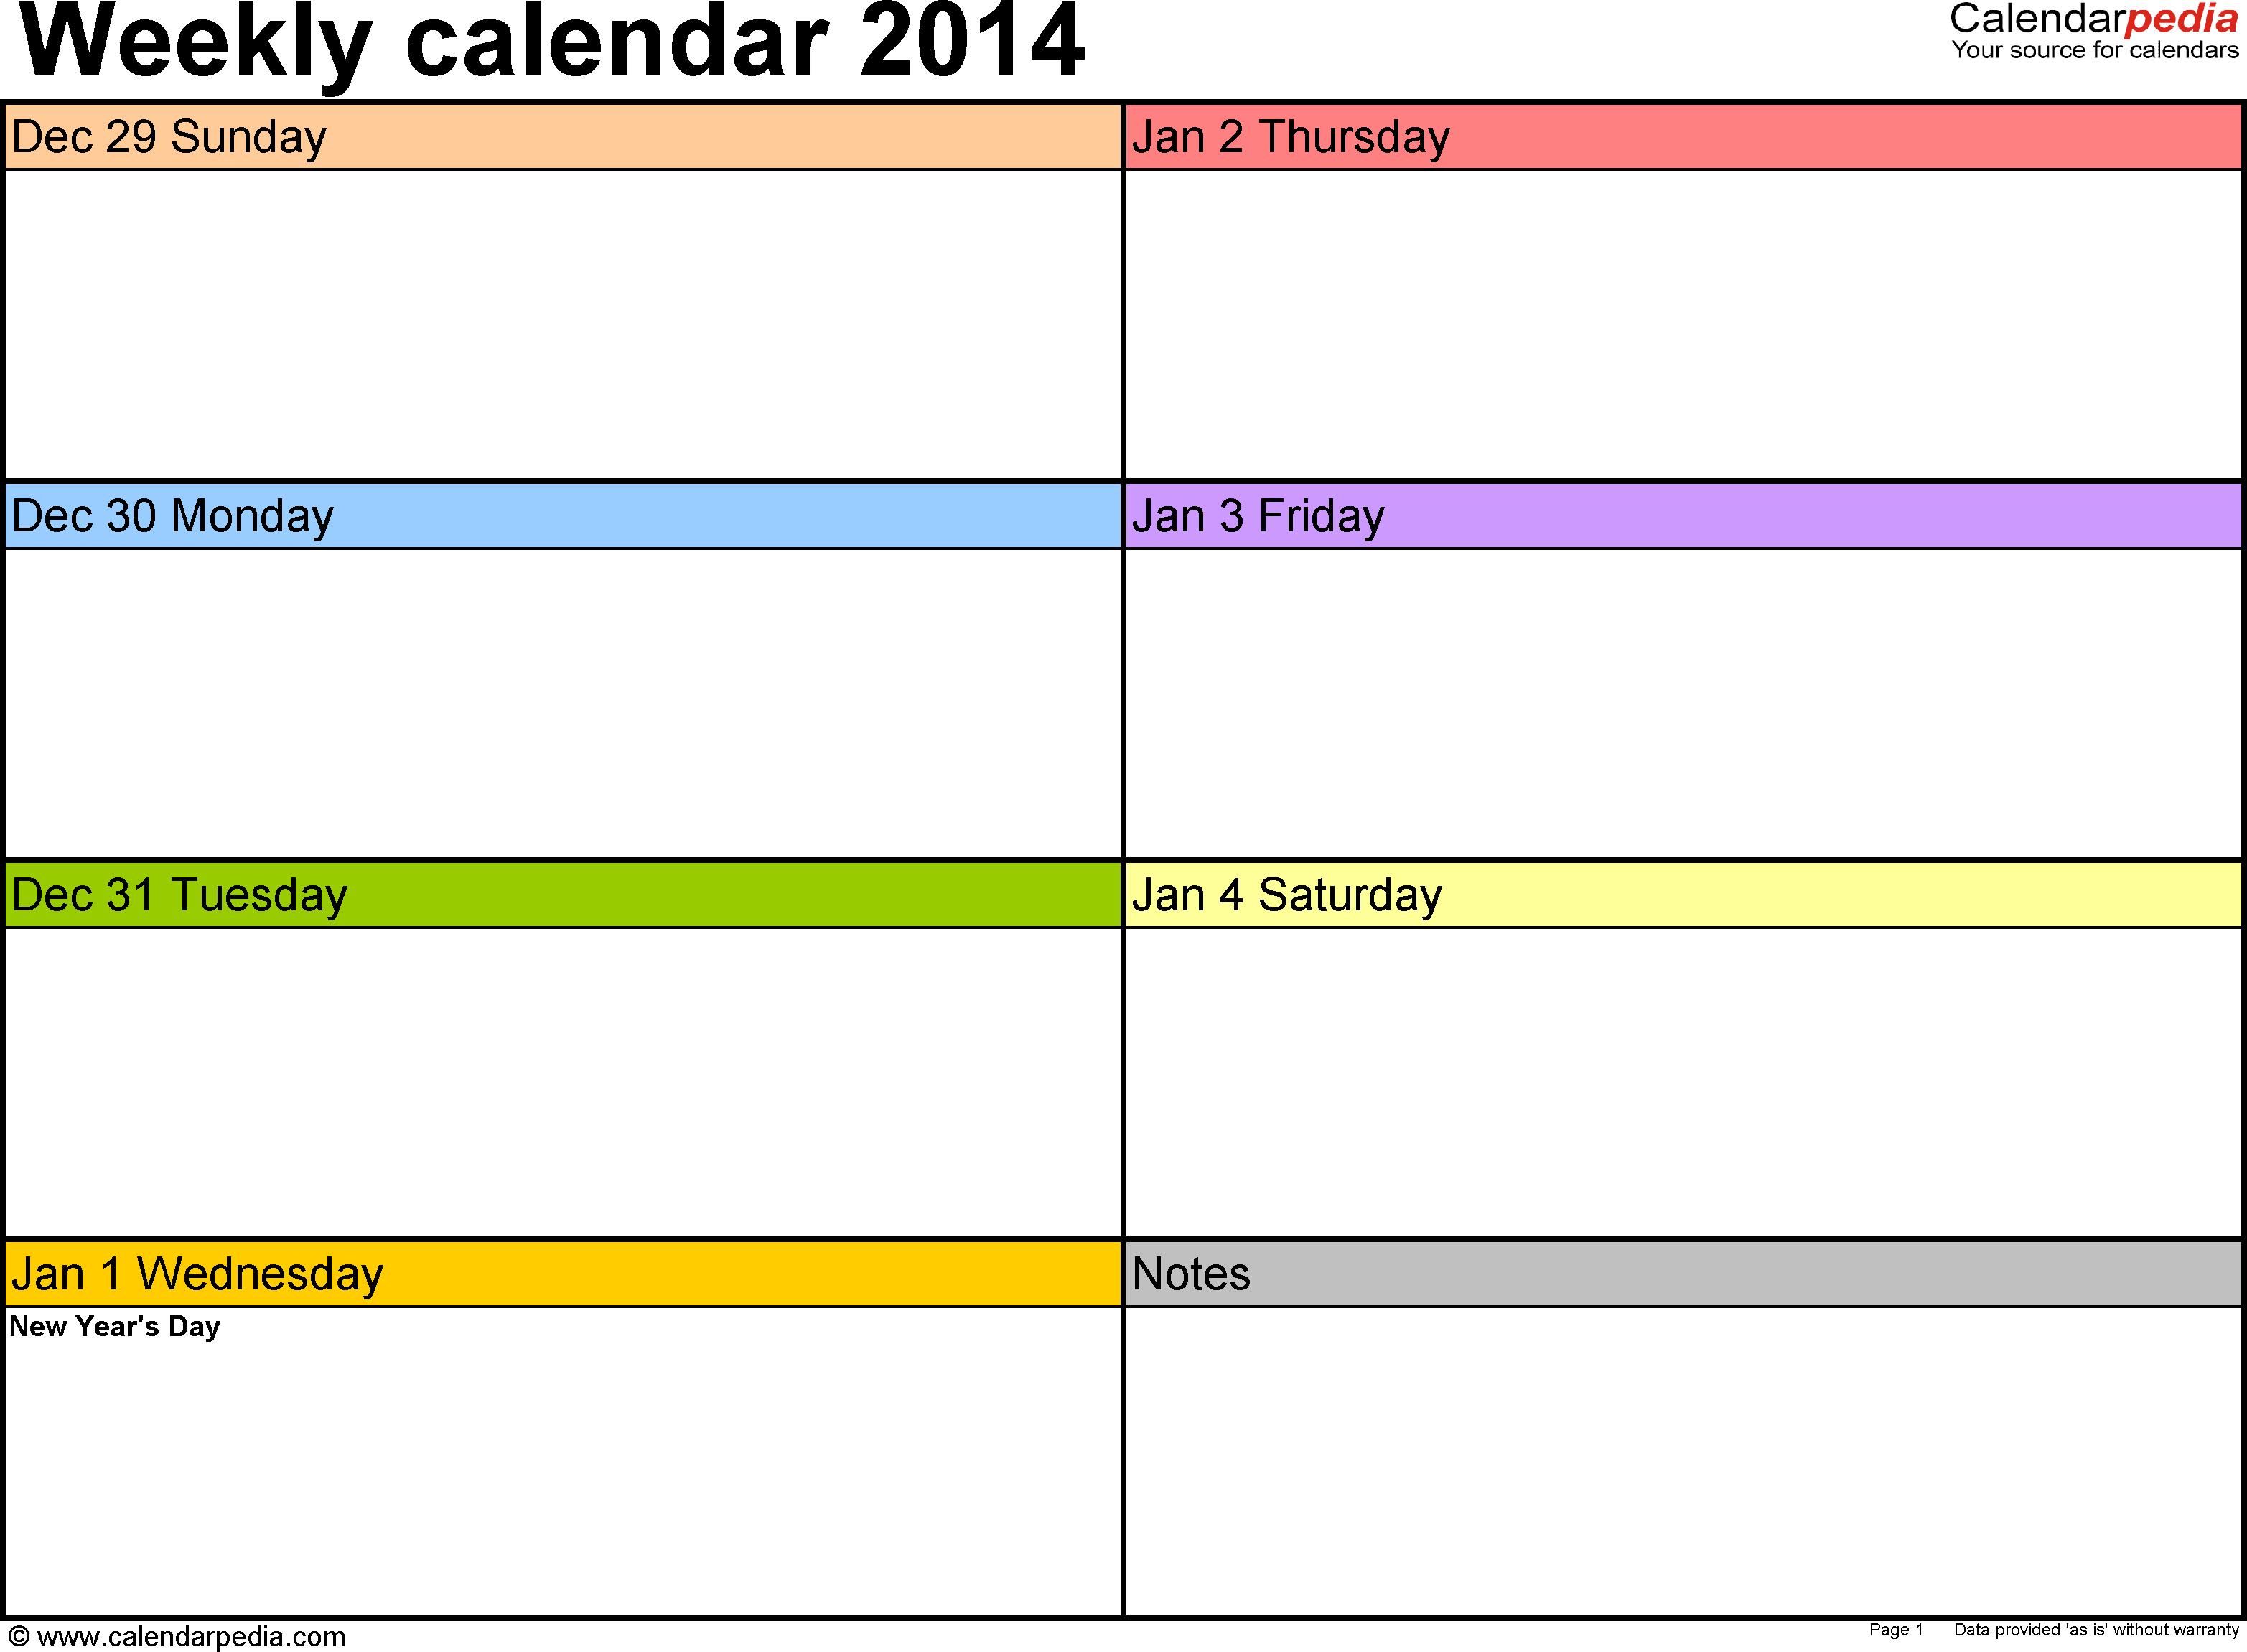 Weekly Calendar 2014 For Word - 4 Free Printable Templates throughout Free Printable Weekly Calendar Templates